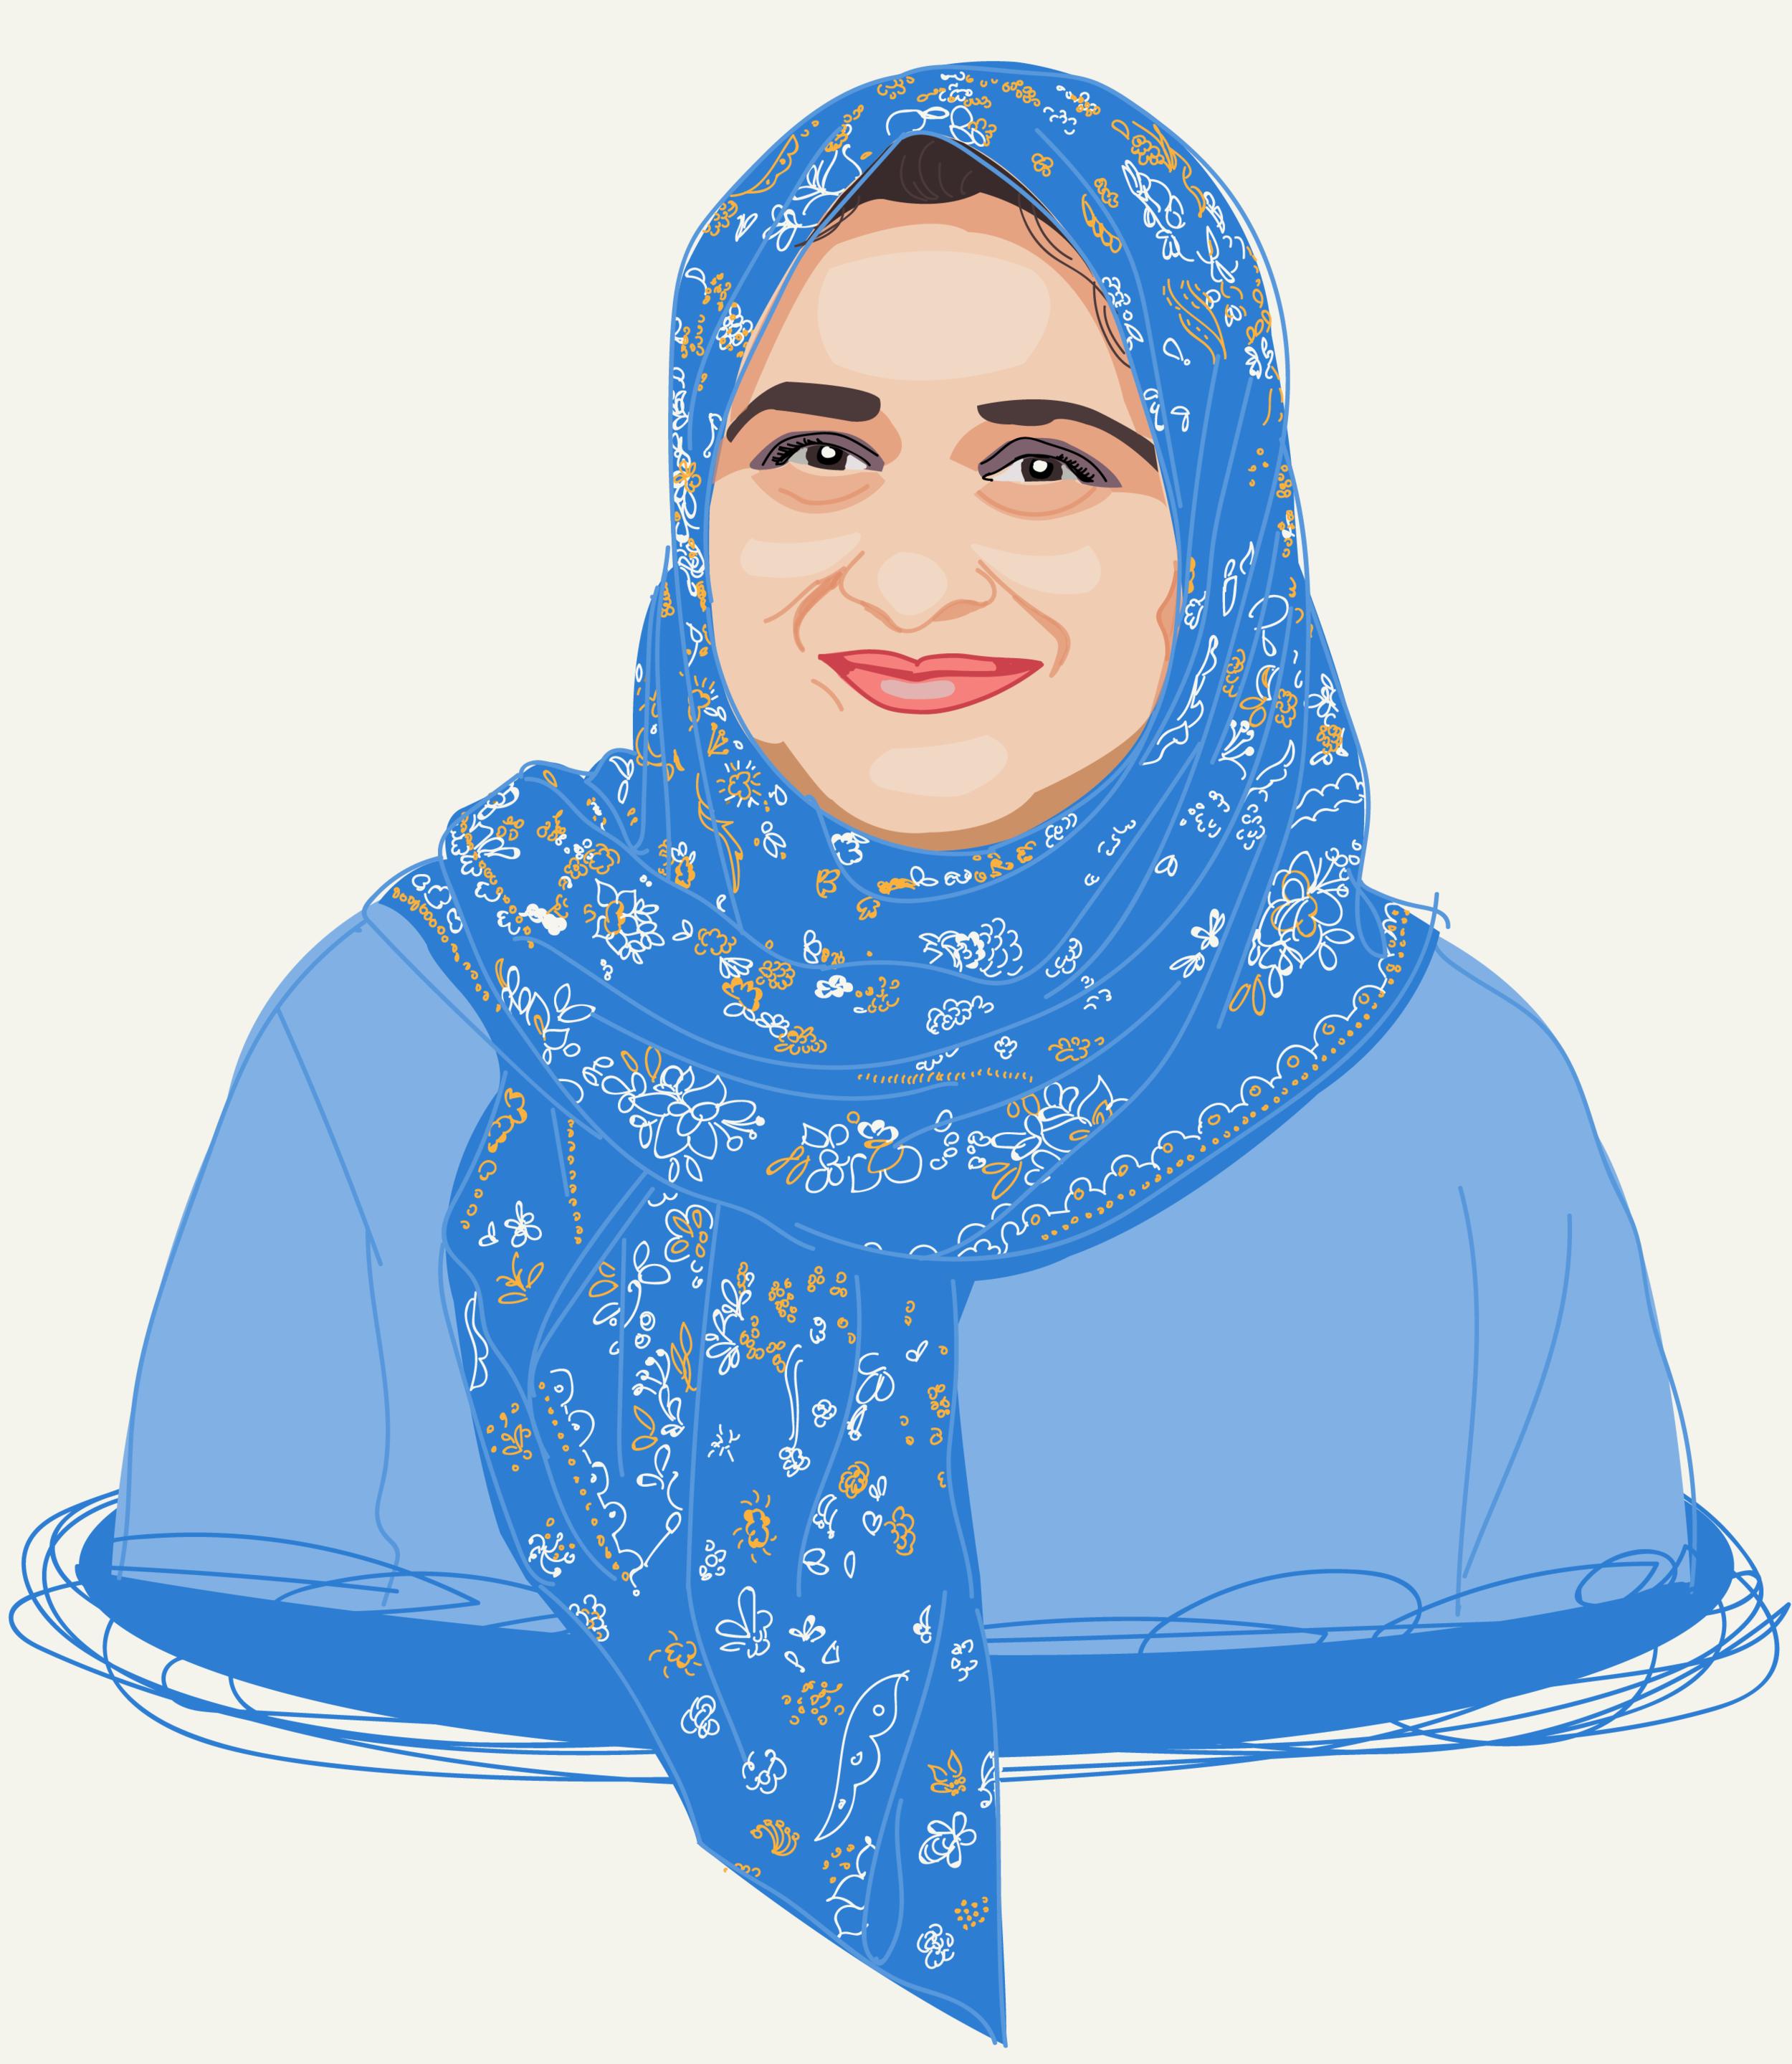 Beautiful woman with headscarf illustration